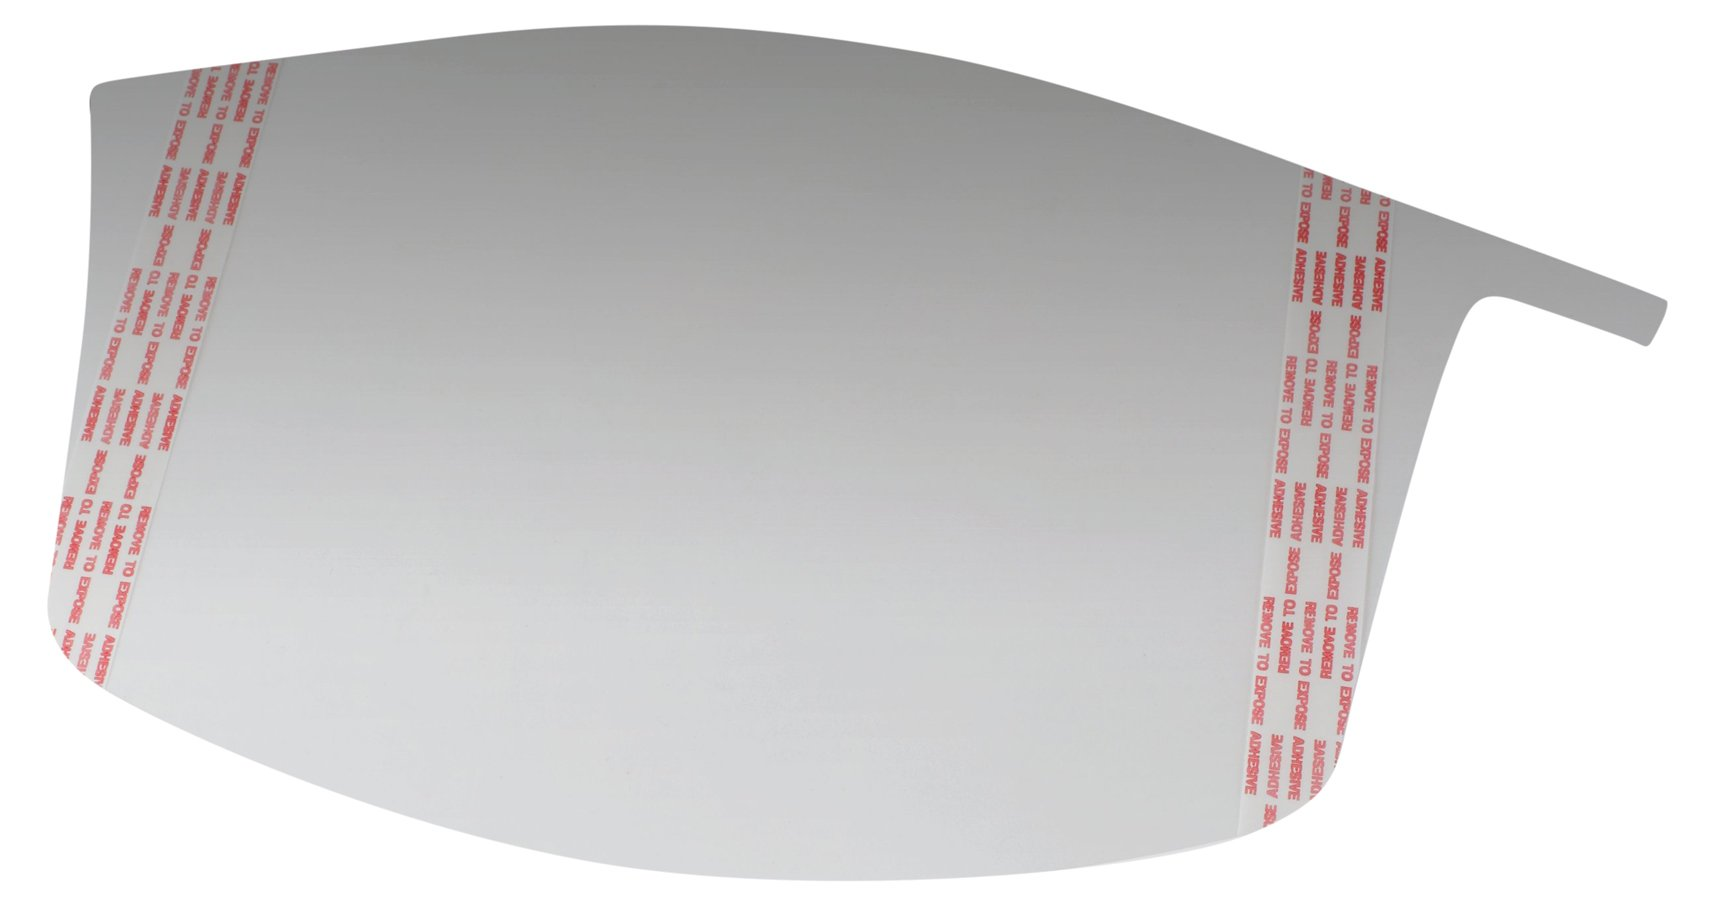 3M Versaflo 37452-case Peel-Off Visor Covers M-928/37452(AAD), for M-927 Premium Visor, 40 EA/Case, Clear (Pack of 40) by 3M